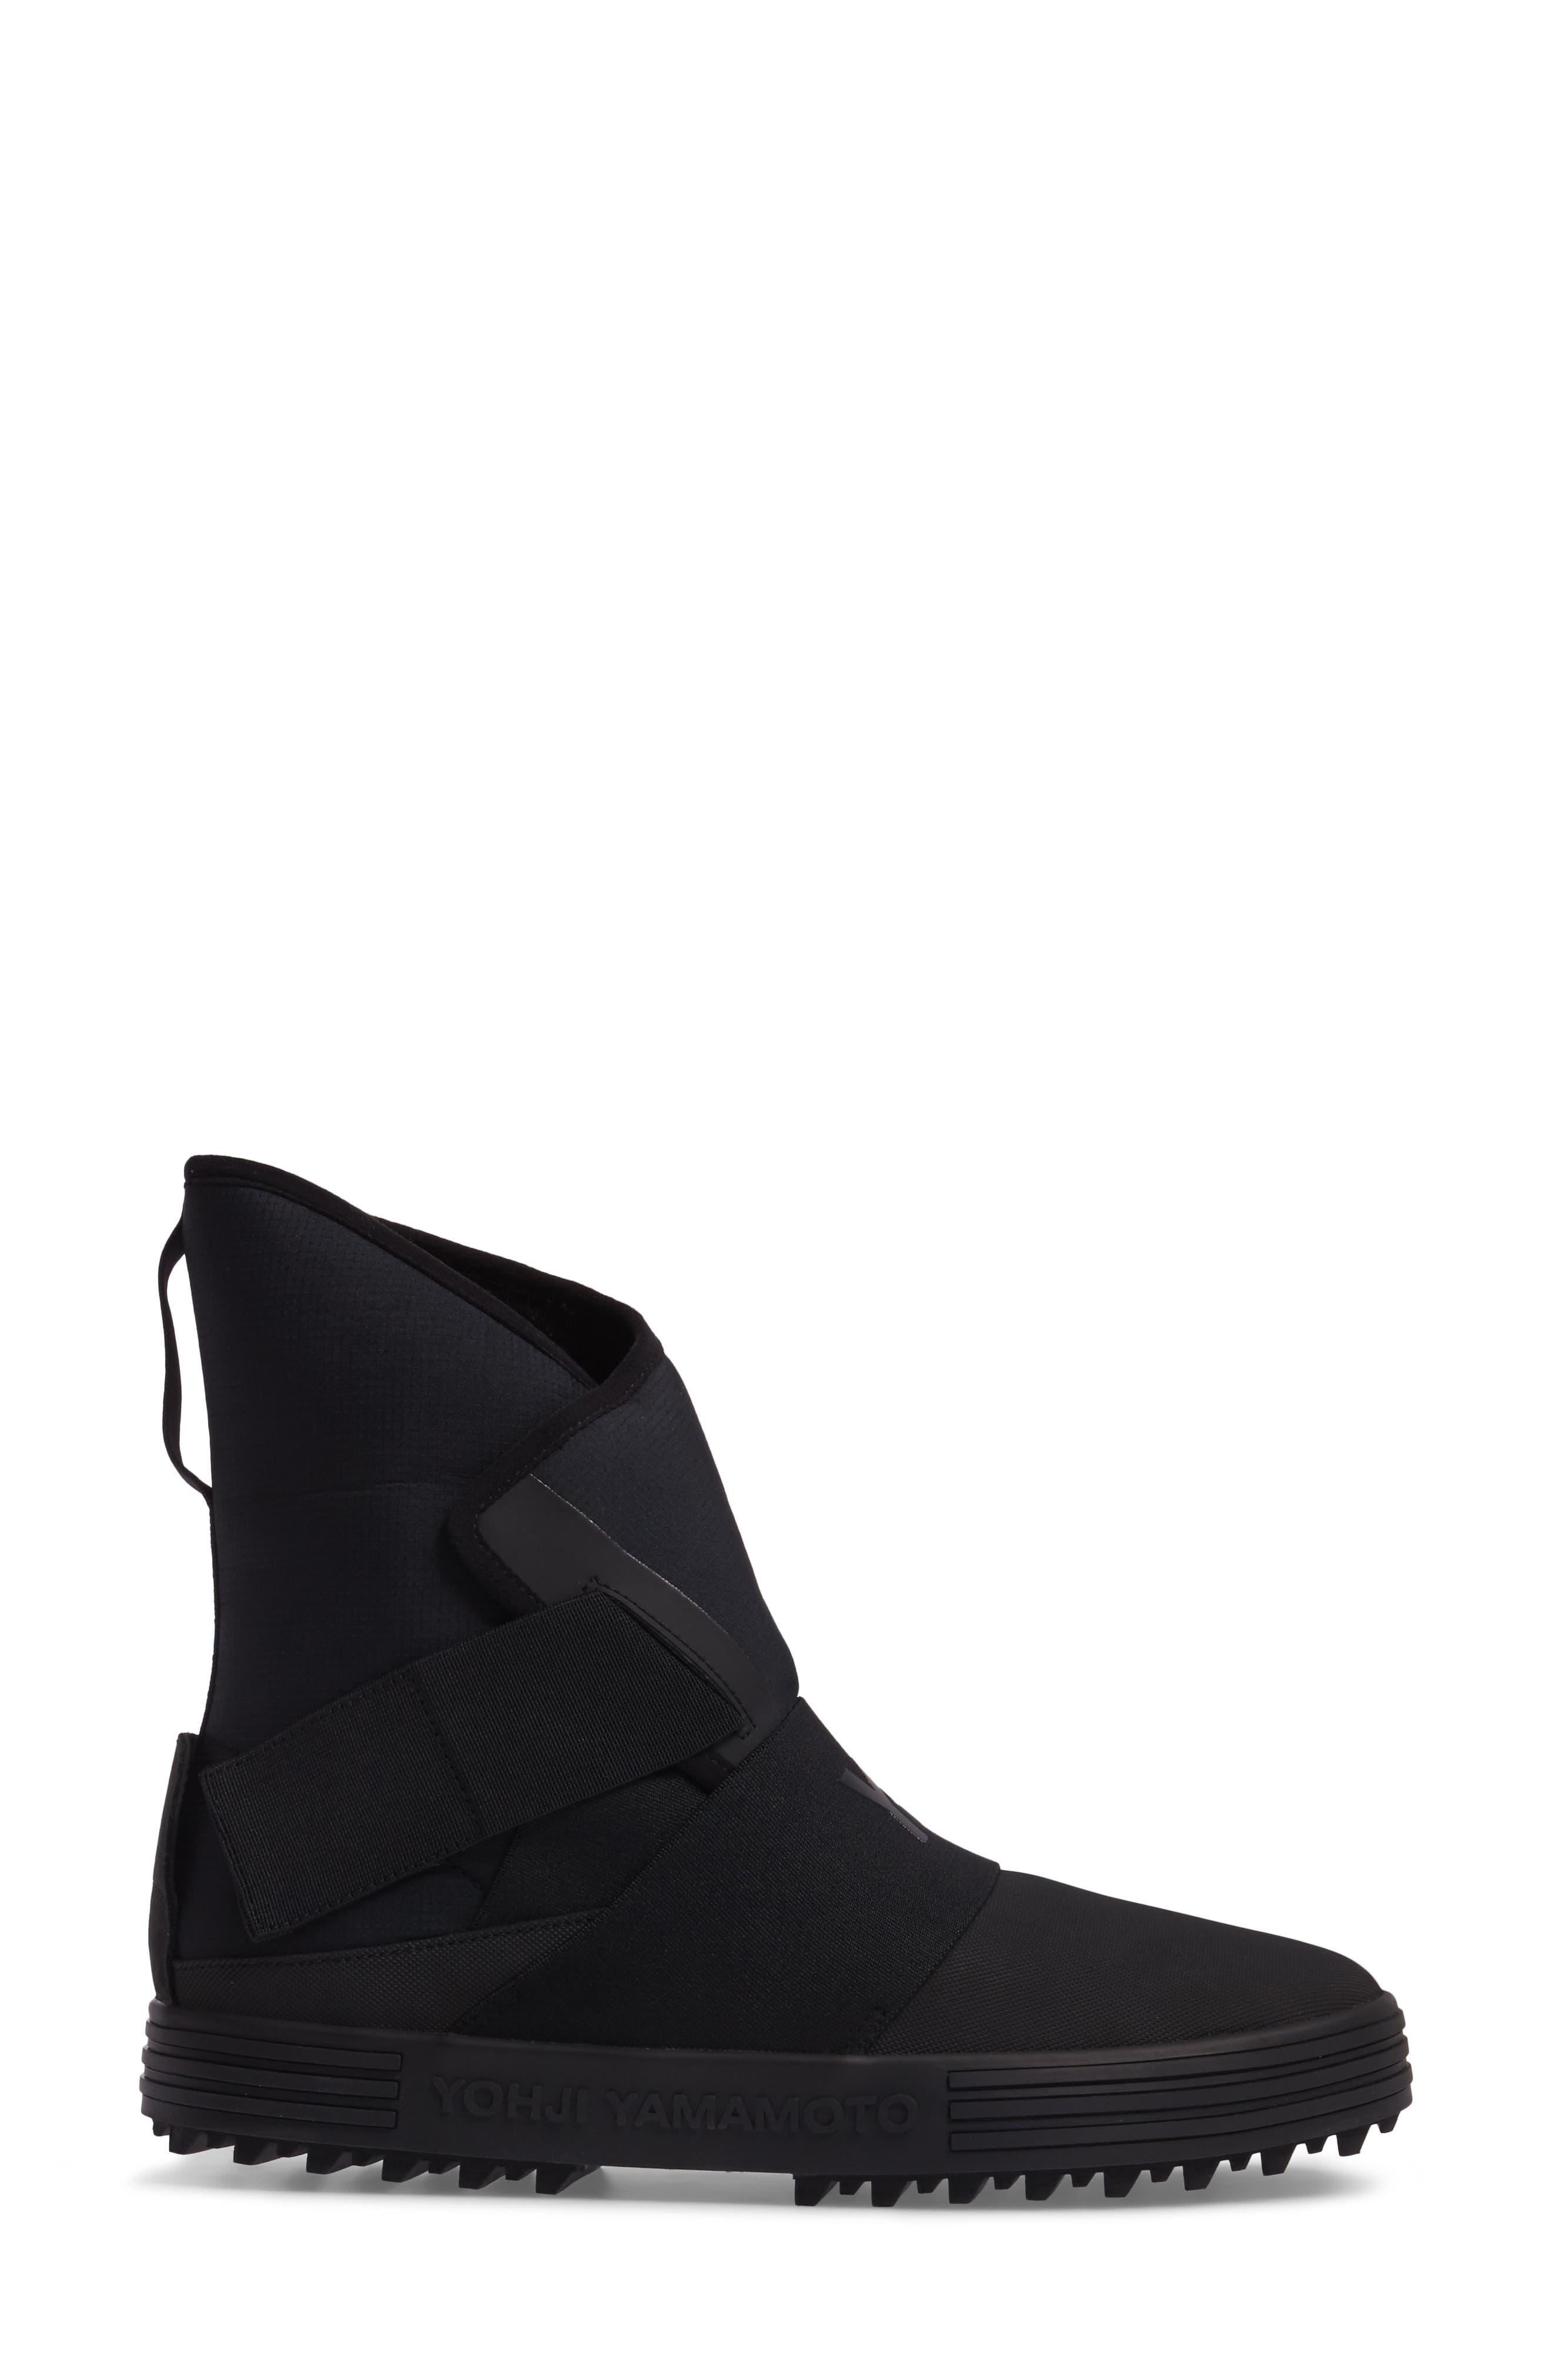 Sno Foxing High Top Sneaker,                             Alternate thumbnail 3, color,                             001